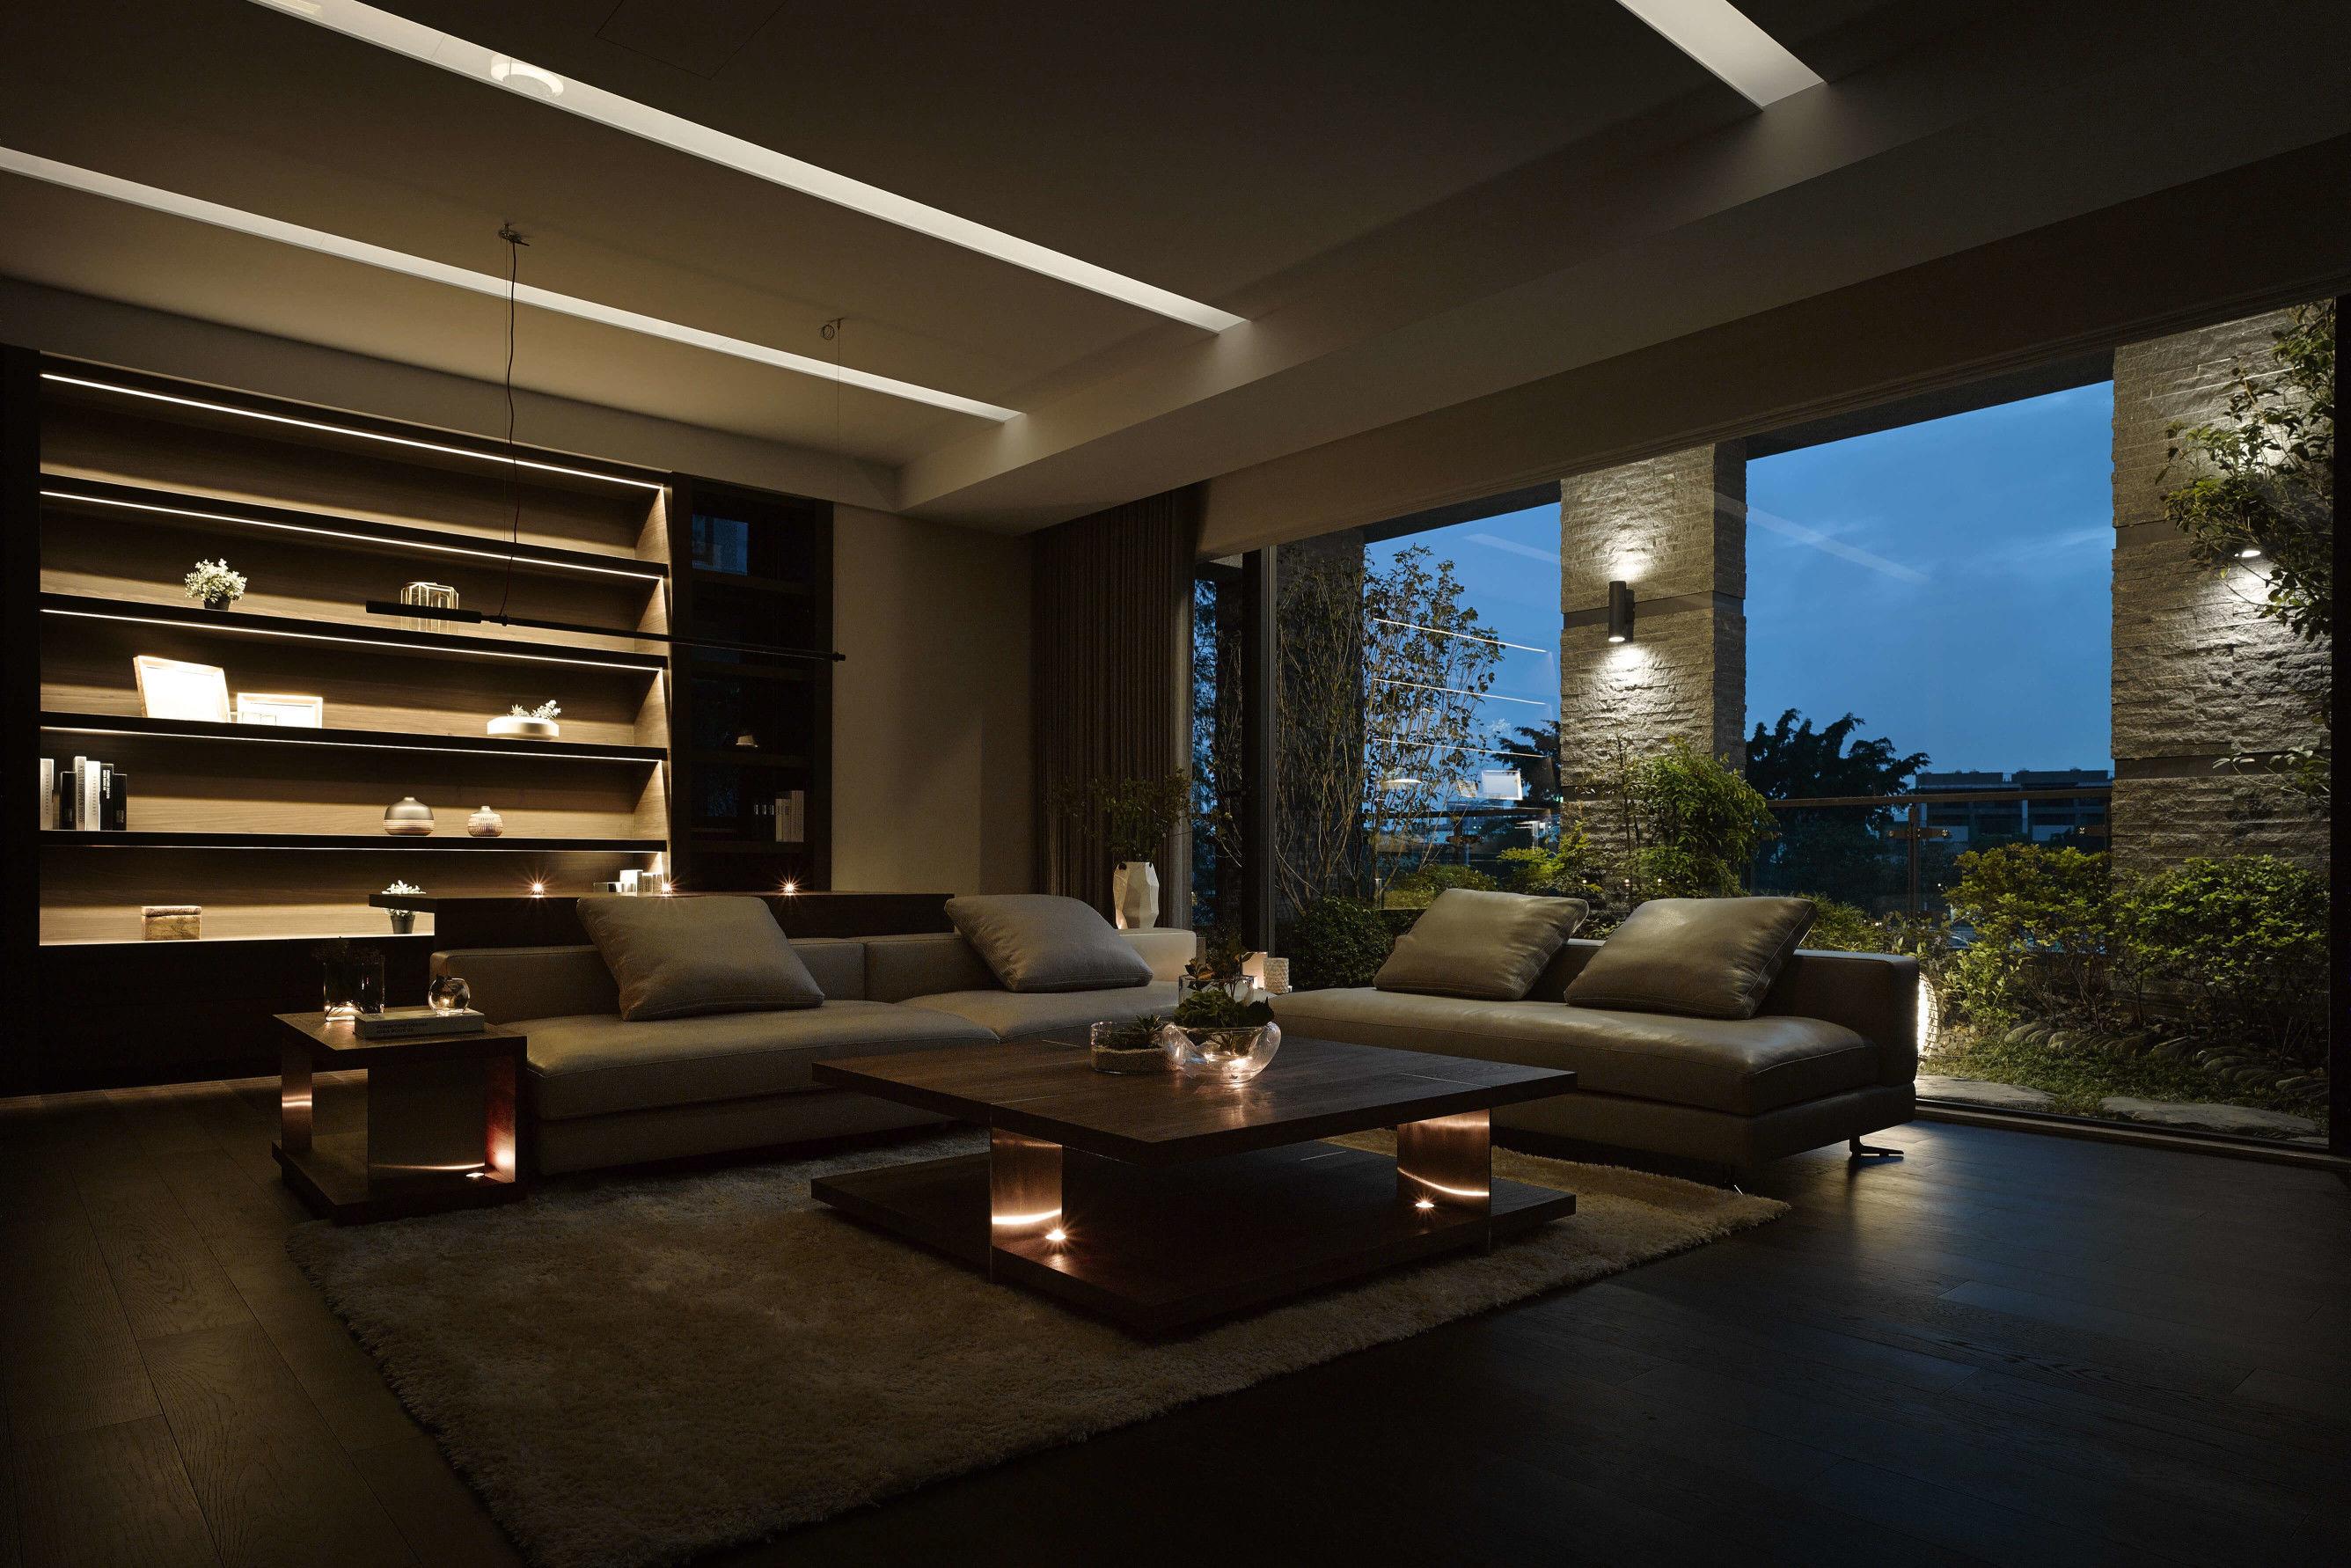 Y House入圍 INSIDE(World Festival of Interiors)世界室內設計節8-分子室內裝修設計公司